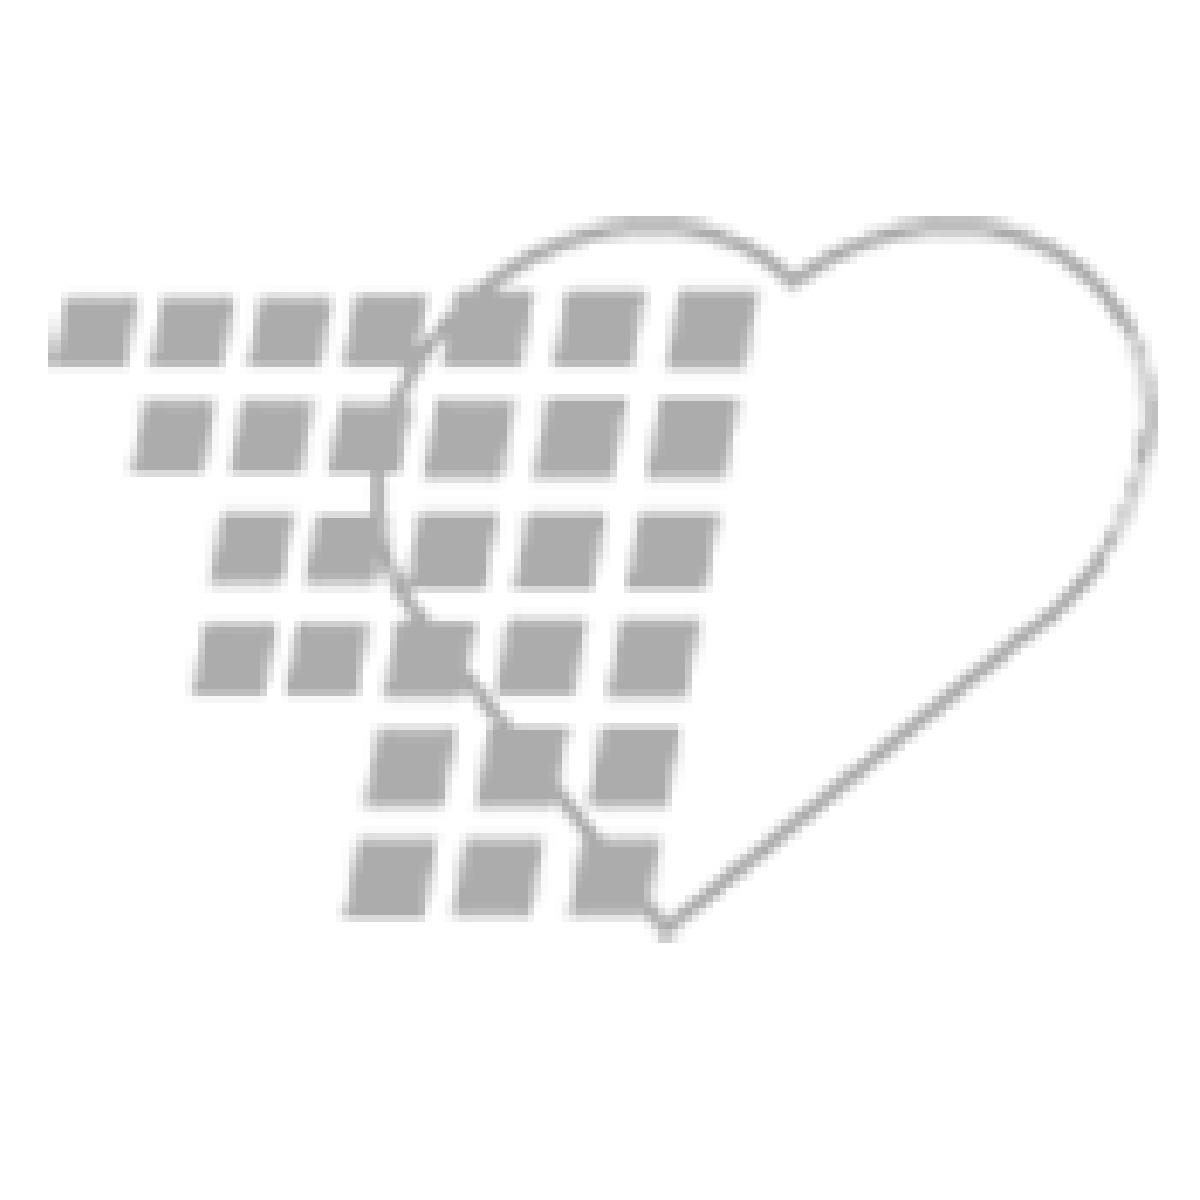 06-93-0037 - Demo Dose® Benadrl Diphenhydramin 25 mg - 100 Pills/Box